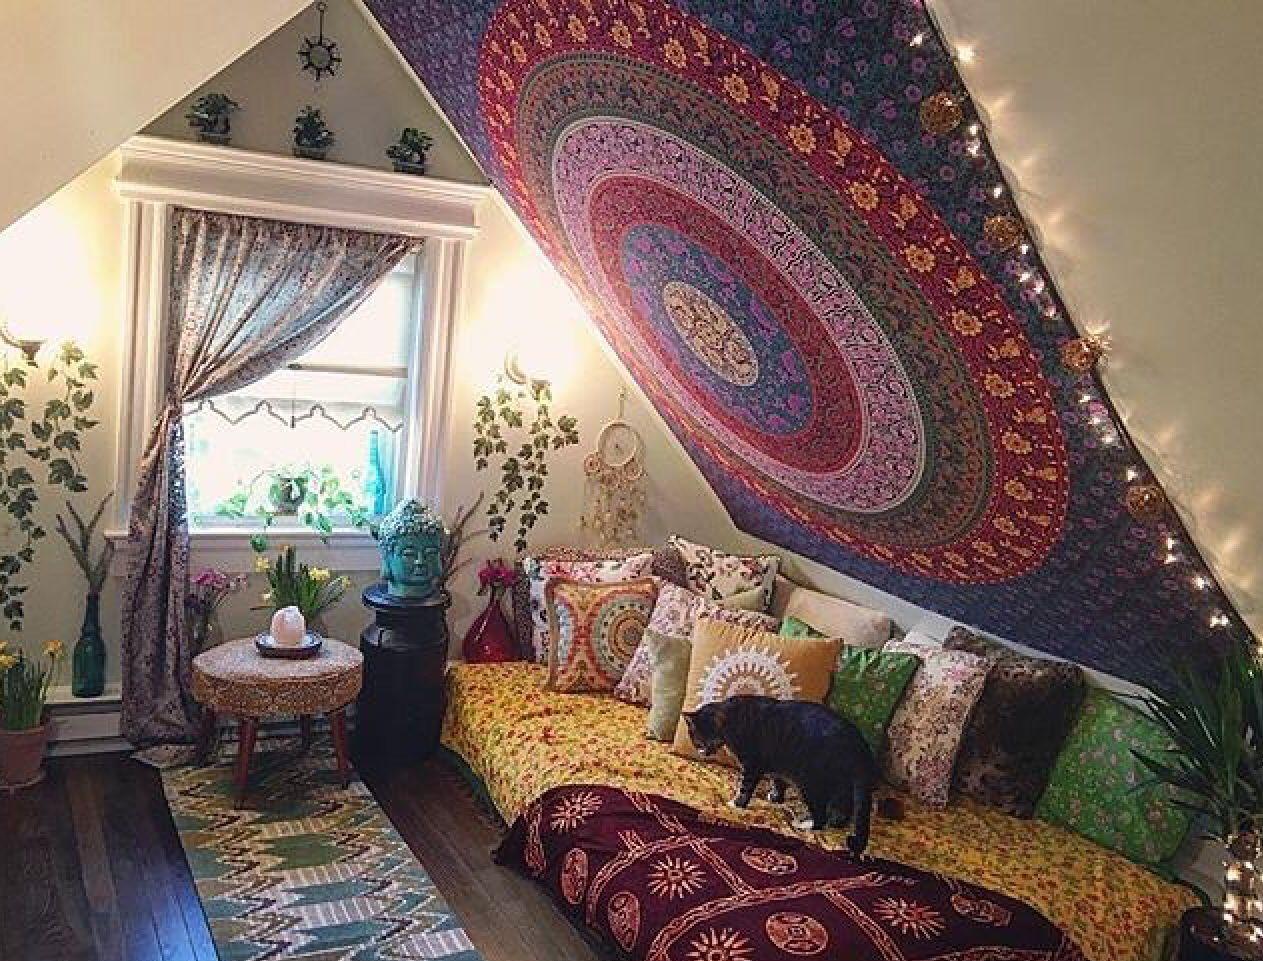 Studio idea yoga roomshome also simbolos magias terapias pinterest rh